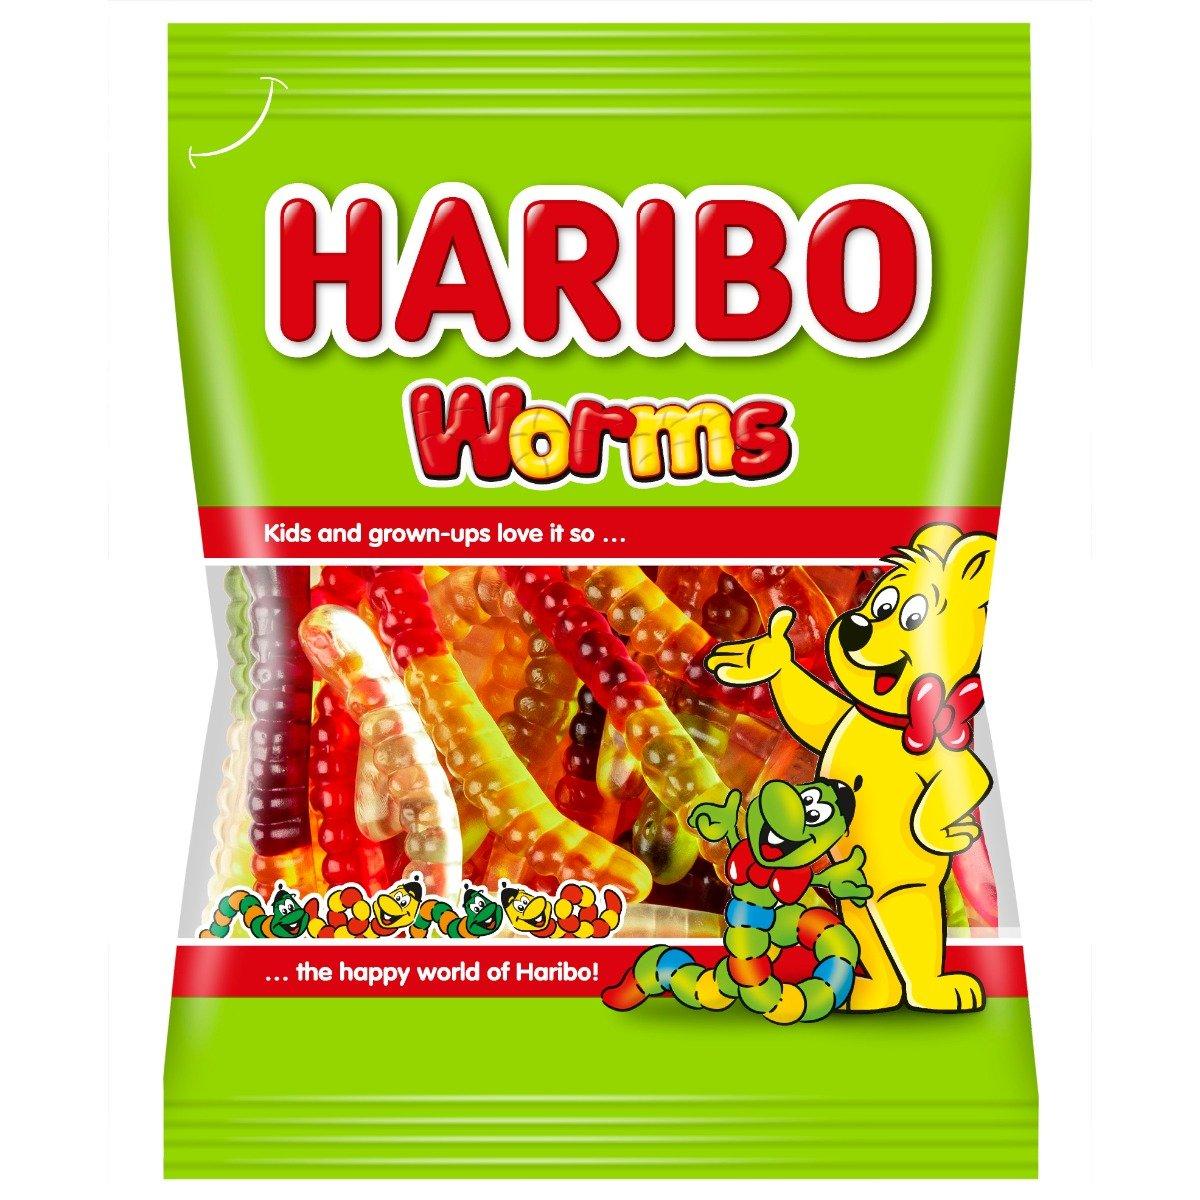 Jeleuri Haribo Wummis , 200 g imagine